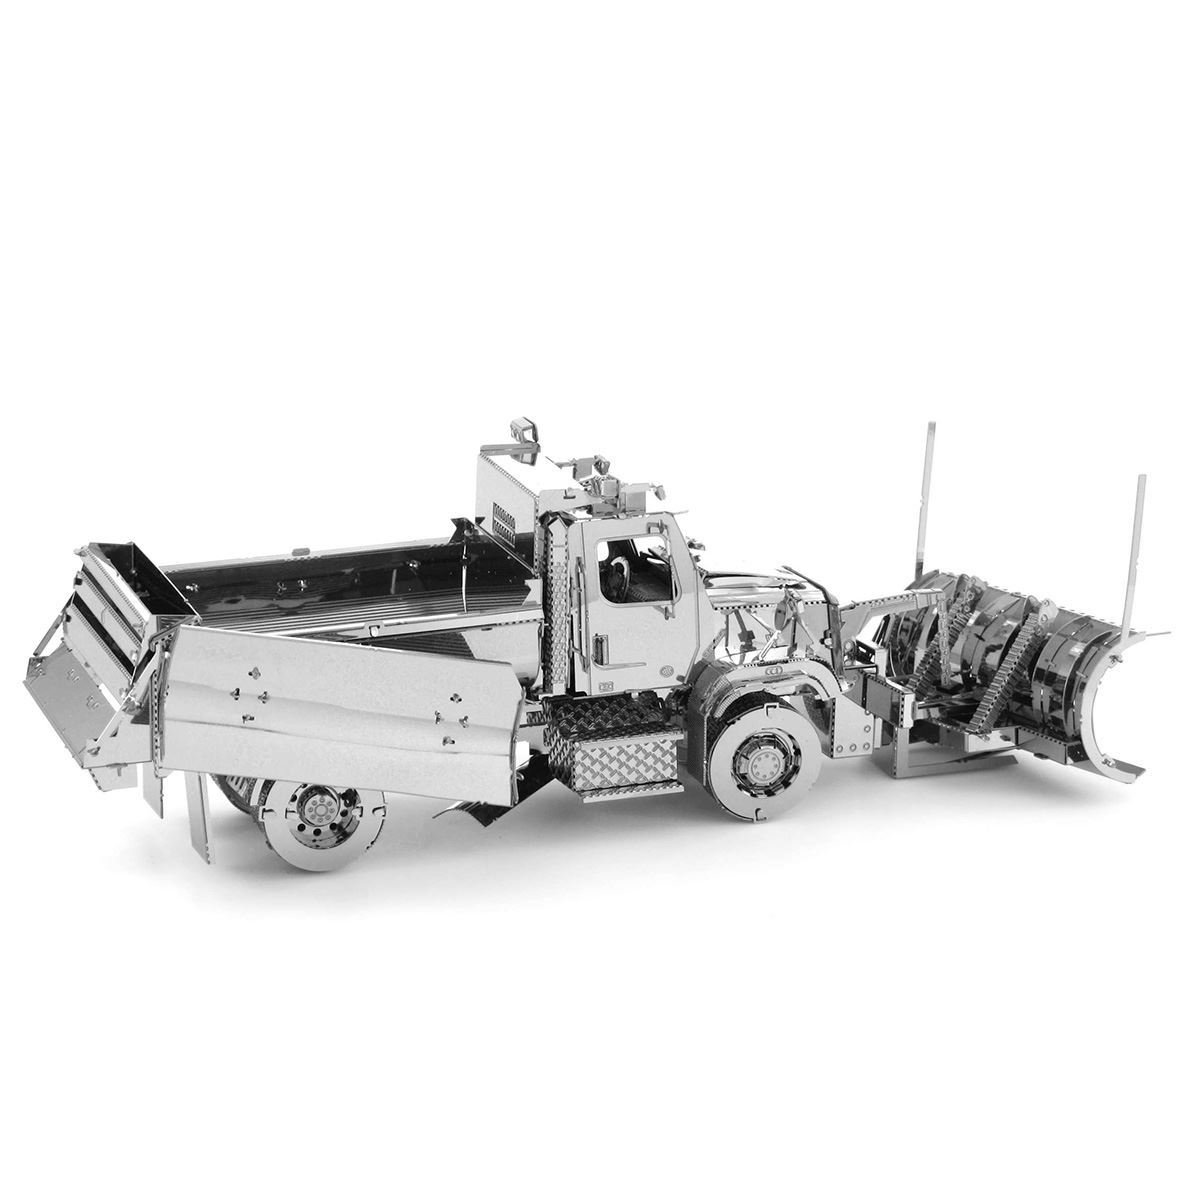 Freightliner Metal Earth 114SD Snow Plow